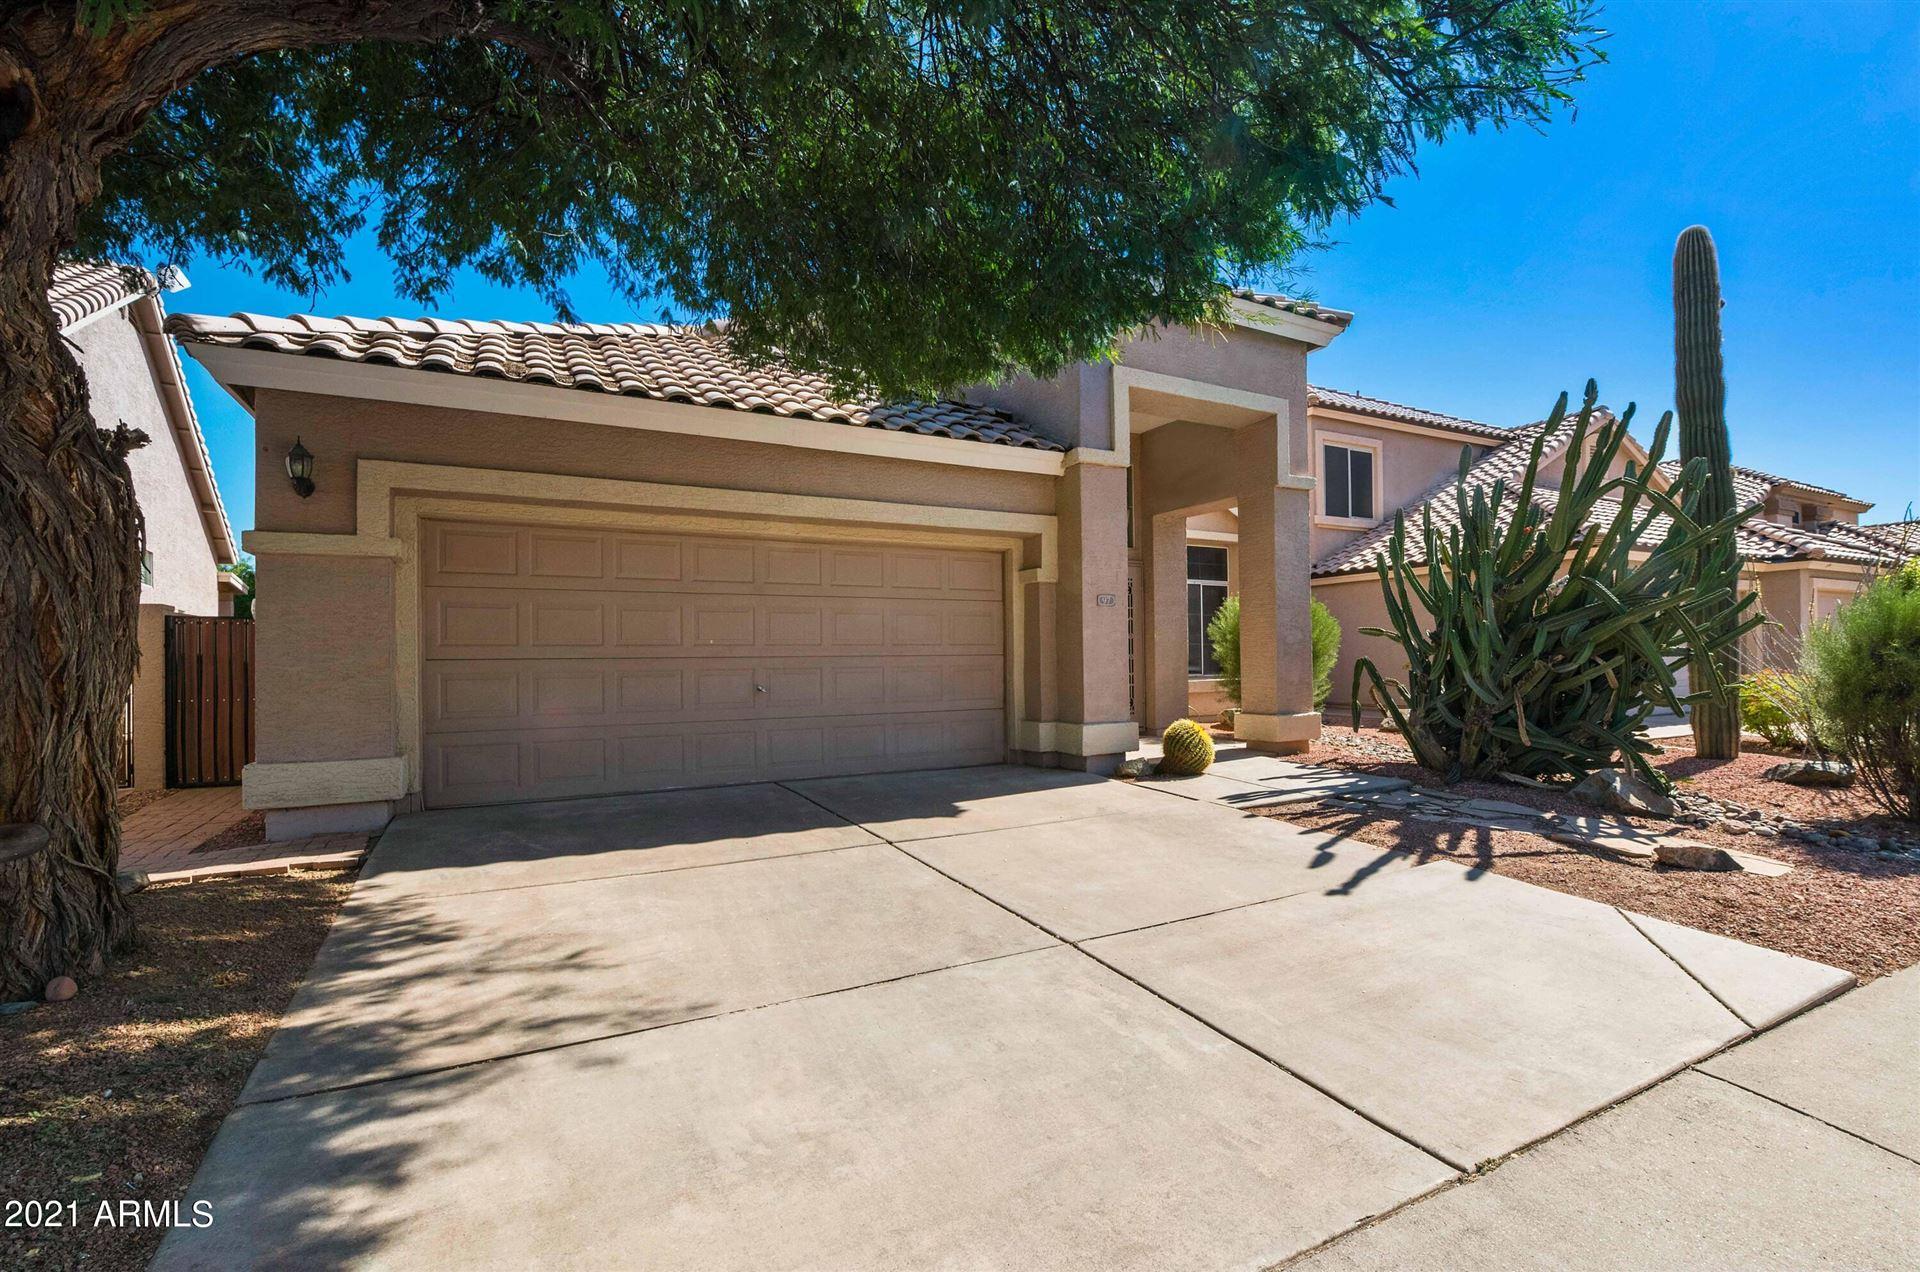 Photo of 97 W BOLERO Drive, Tempe, AZ 85284 (MLS # 6293408)